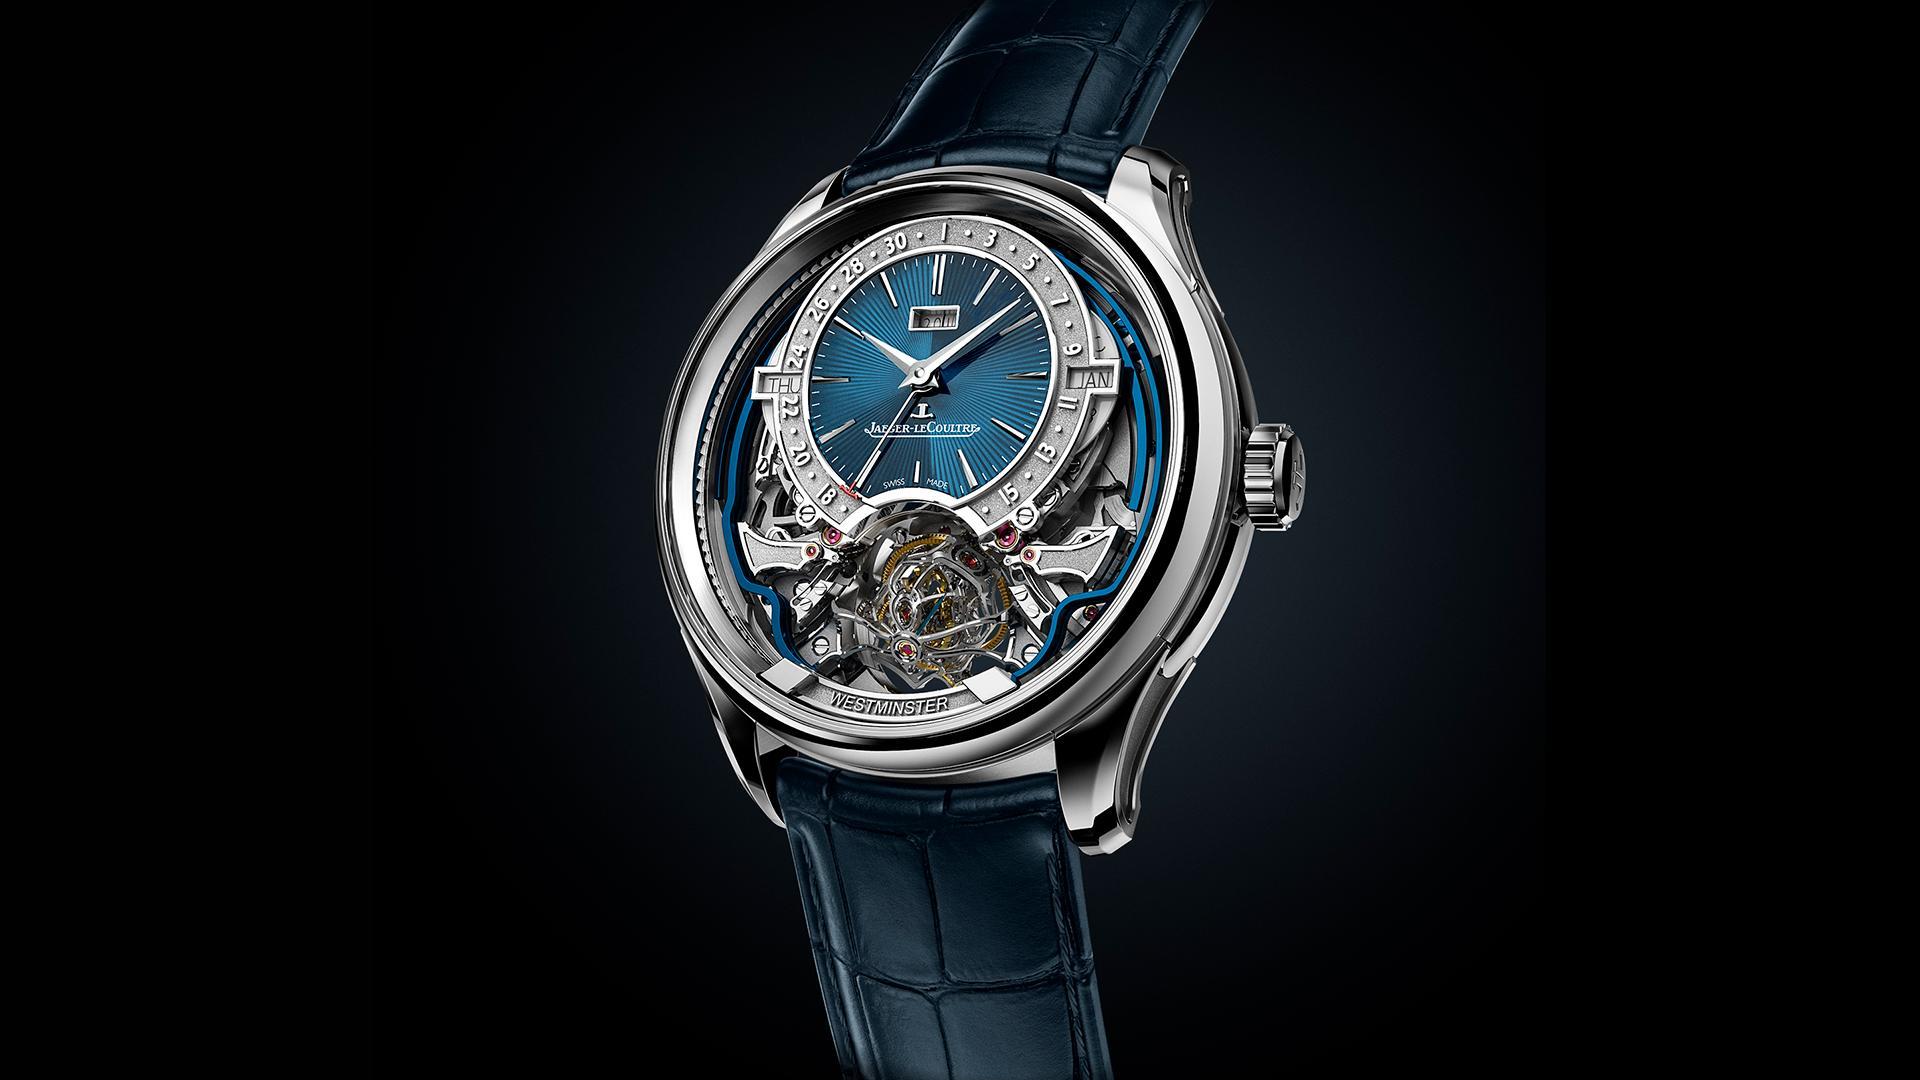 Jaeger-LeCoultre Master Grande Tradition Gyrotourbillon Westminster Perpétuel watch